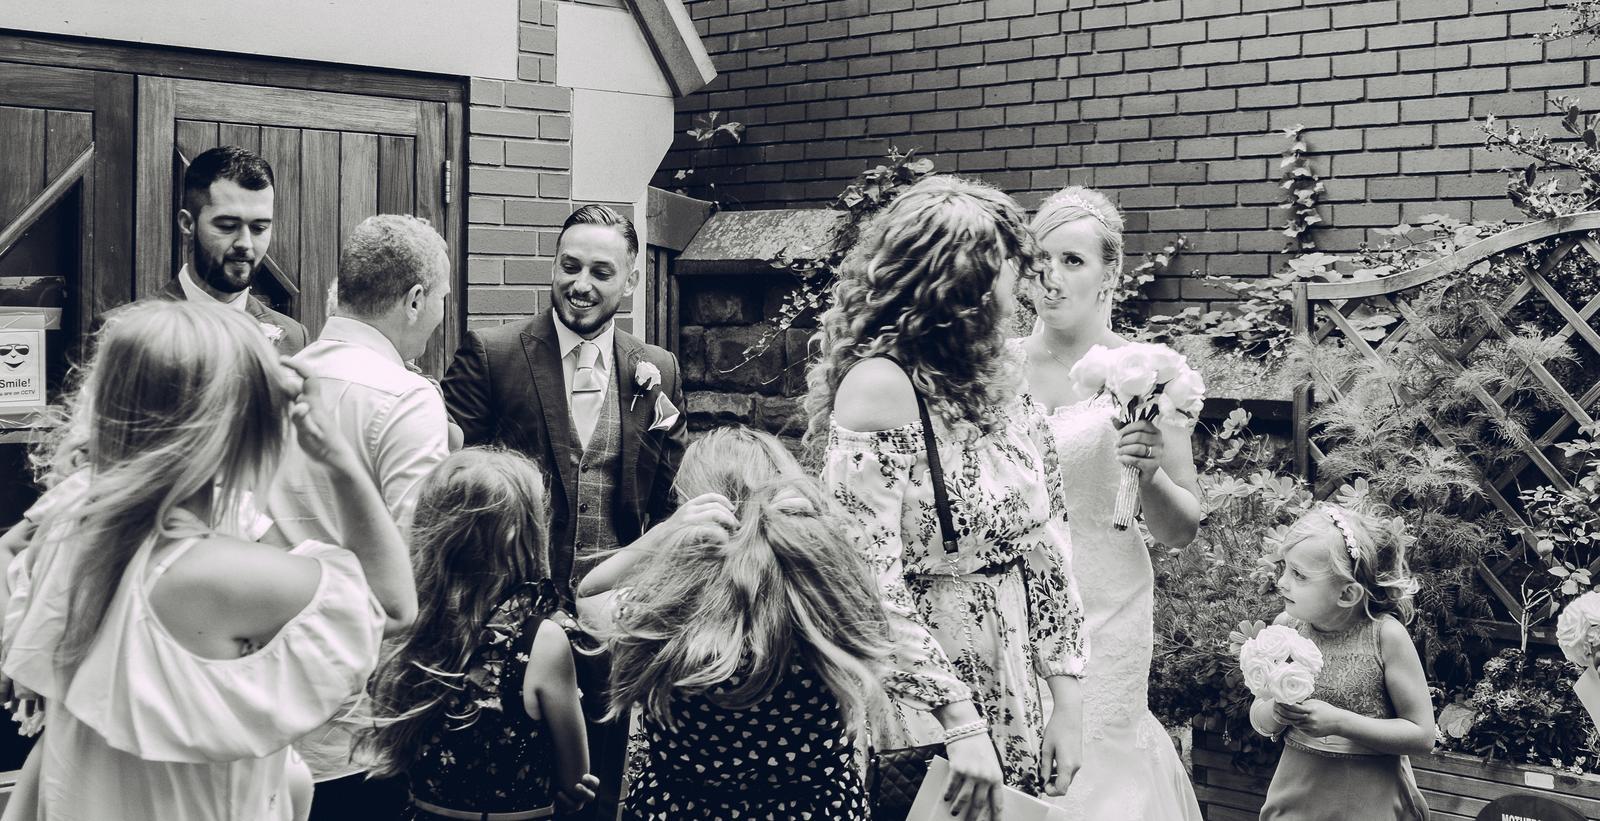 Mr&Mrs Ogborne, Wolverhampton - Obrázok č. 11